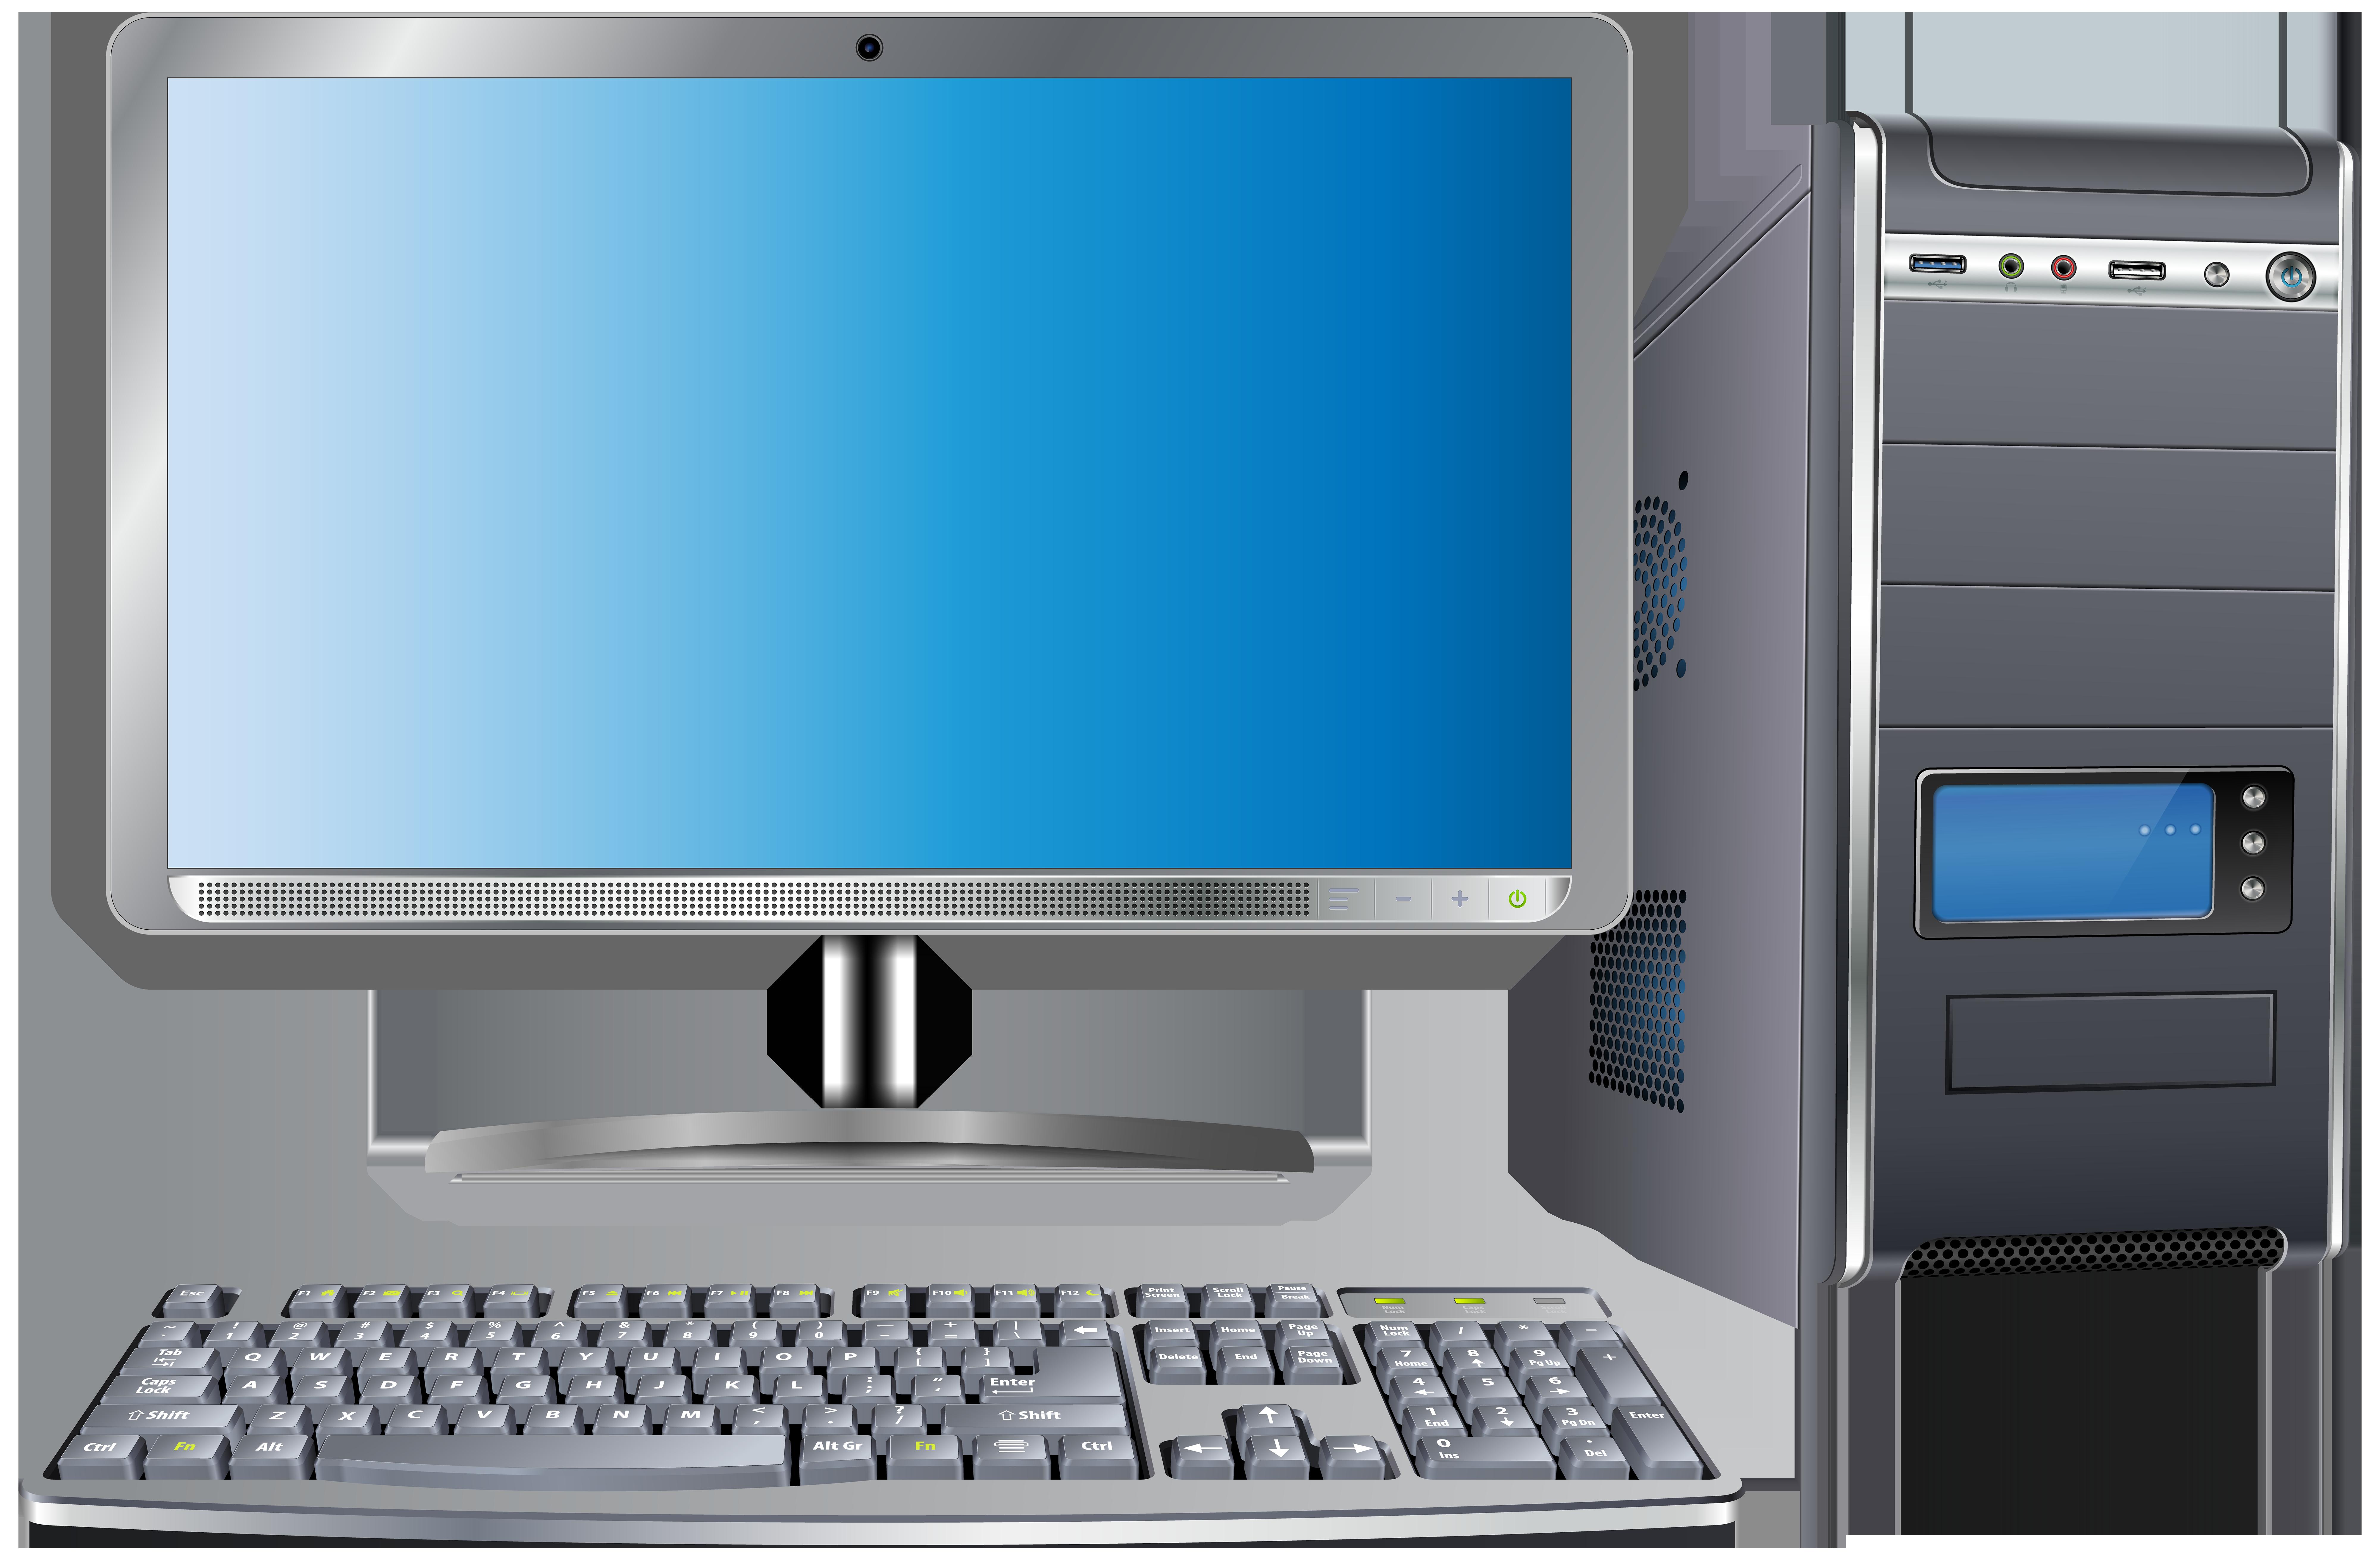 Computer Set Transparent PNG Clip Art Image.